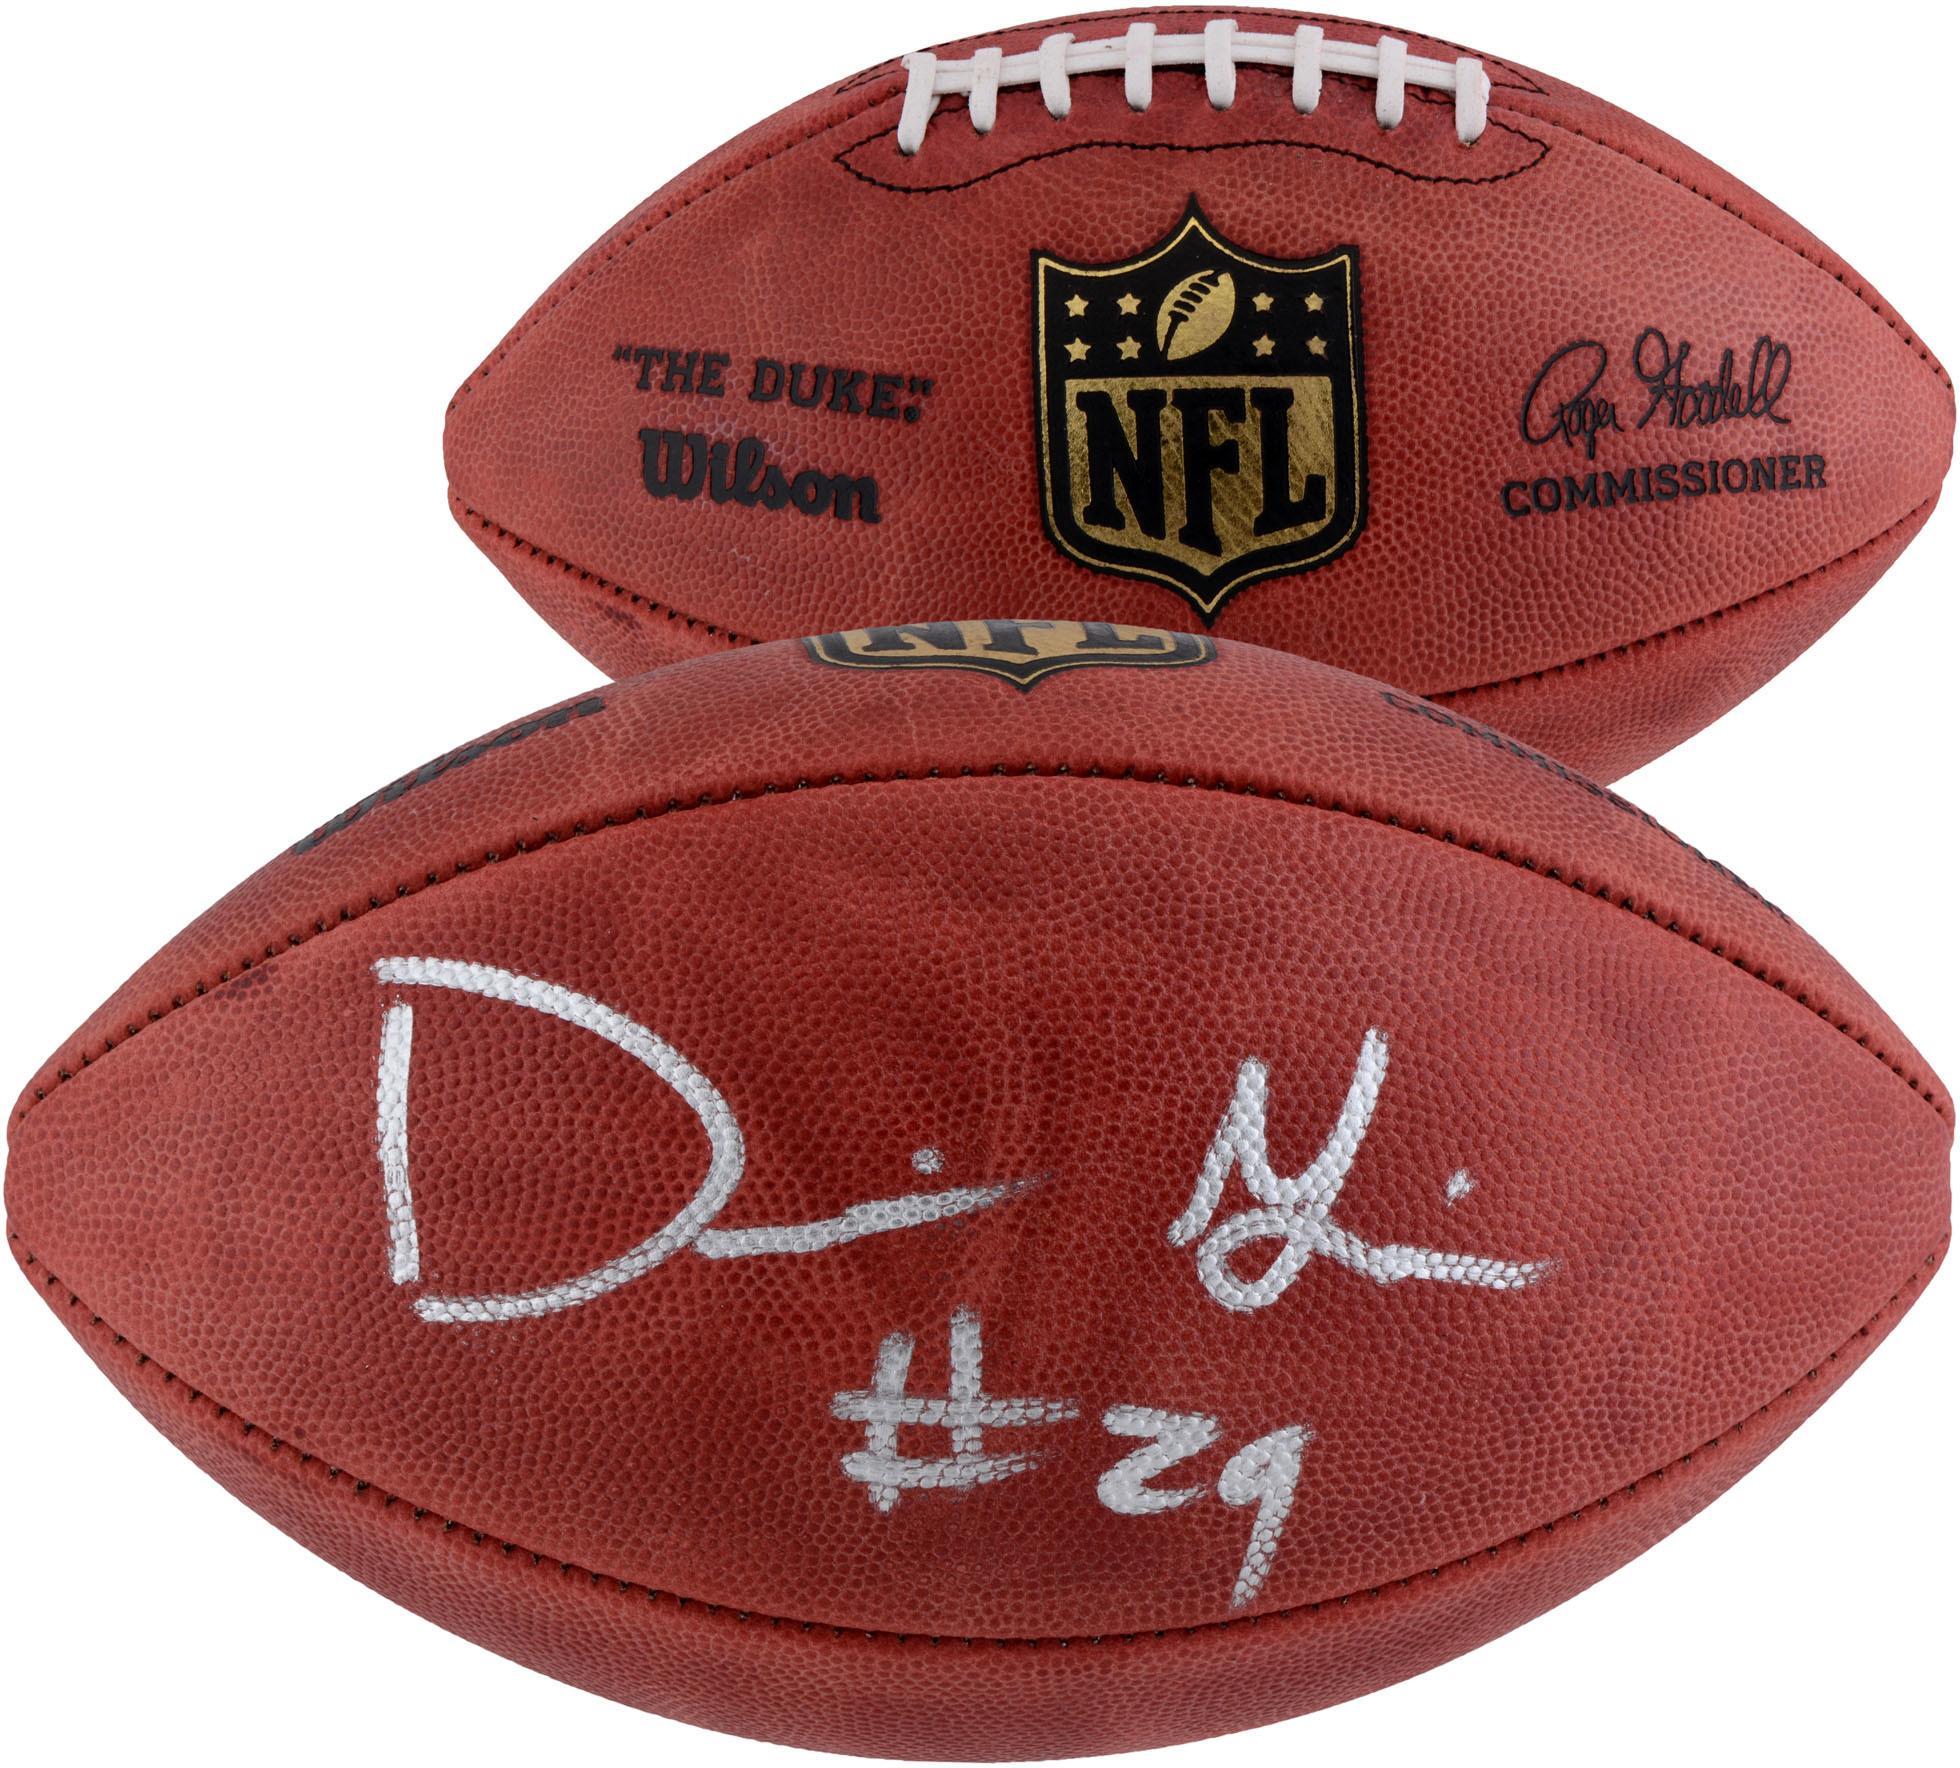 Derrius Guice Washington Redskins Autographed Duke Pro Football - Fanatics Authentic Certified